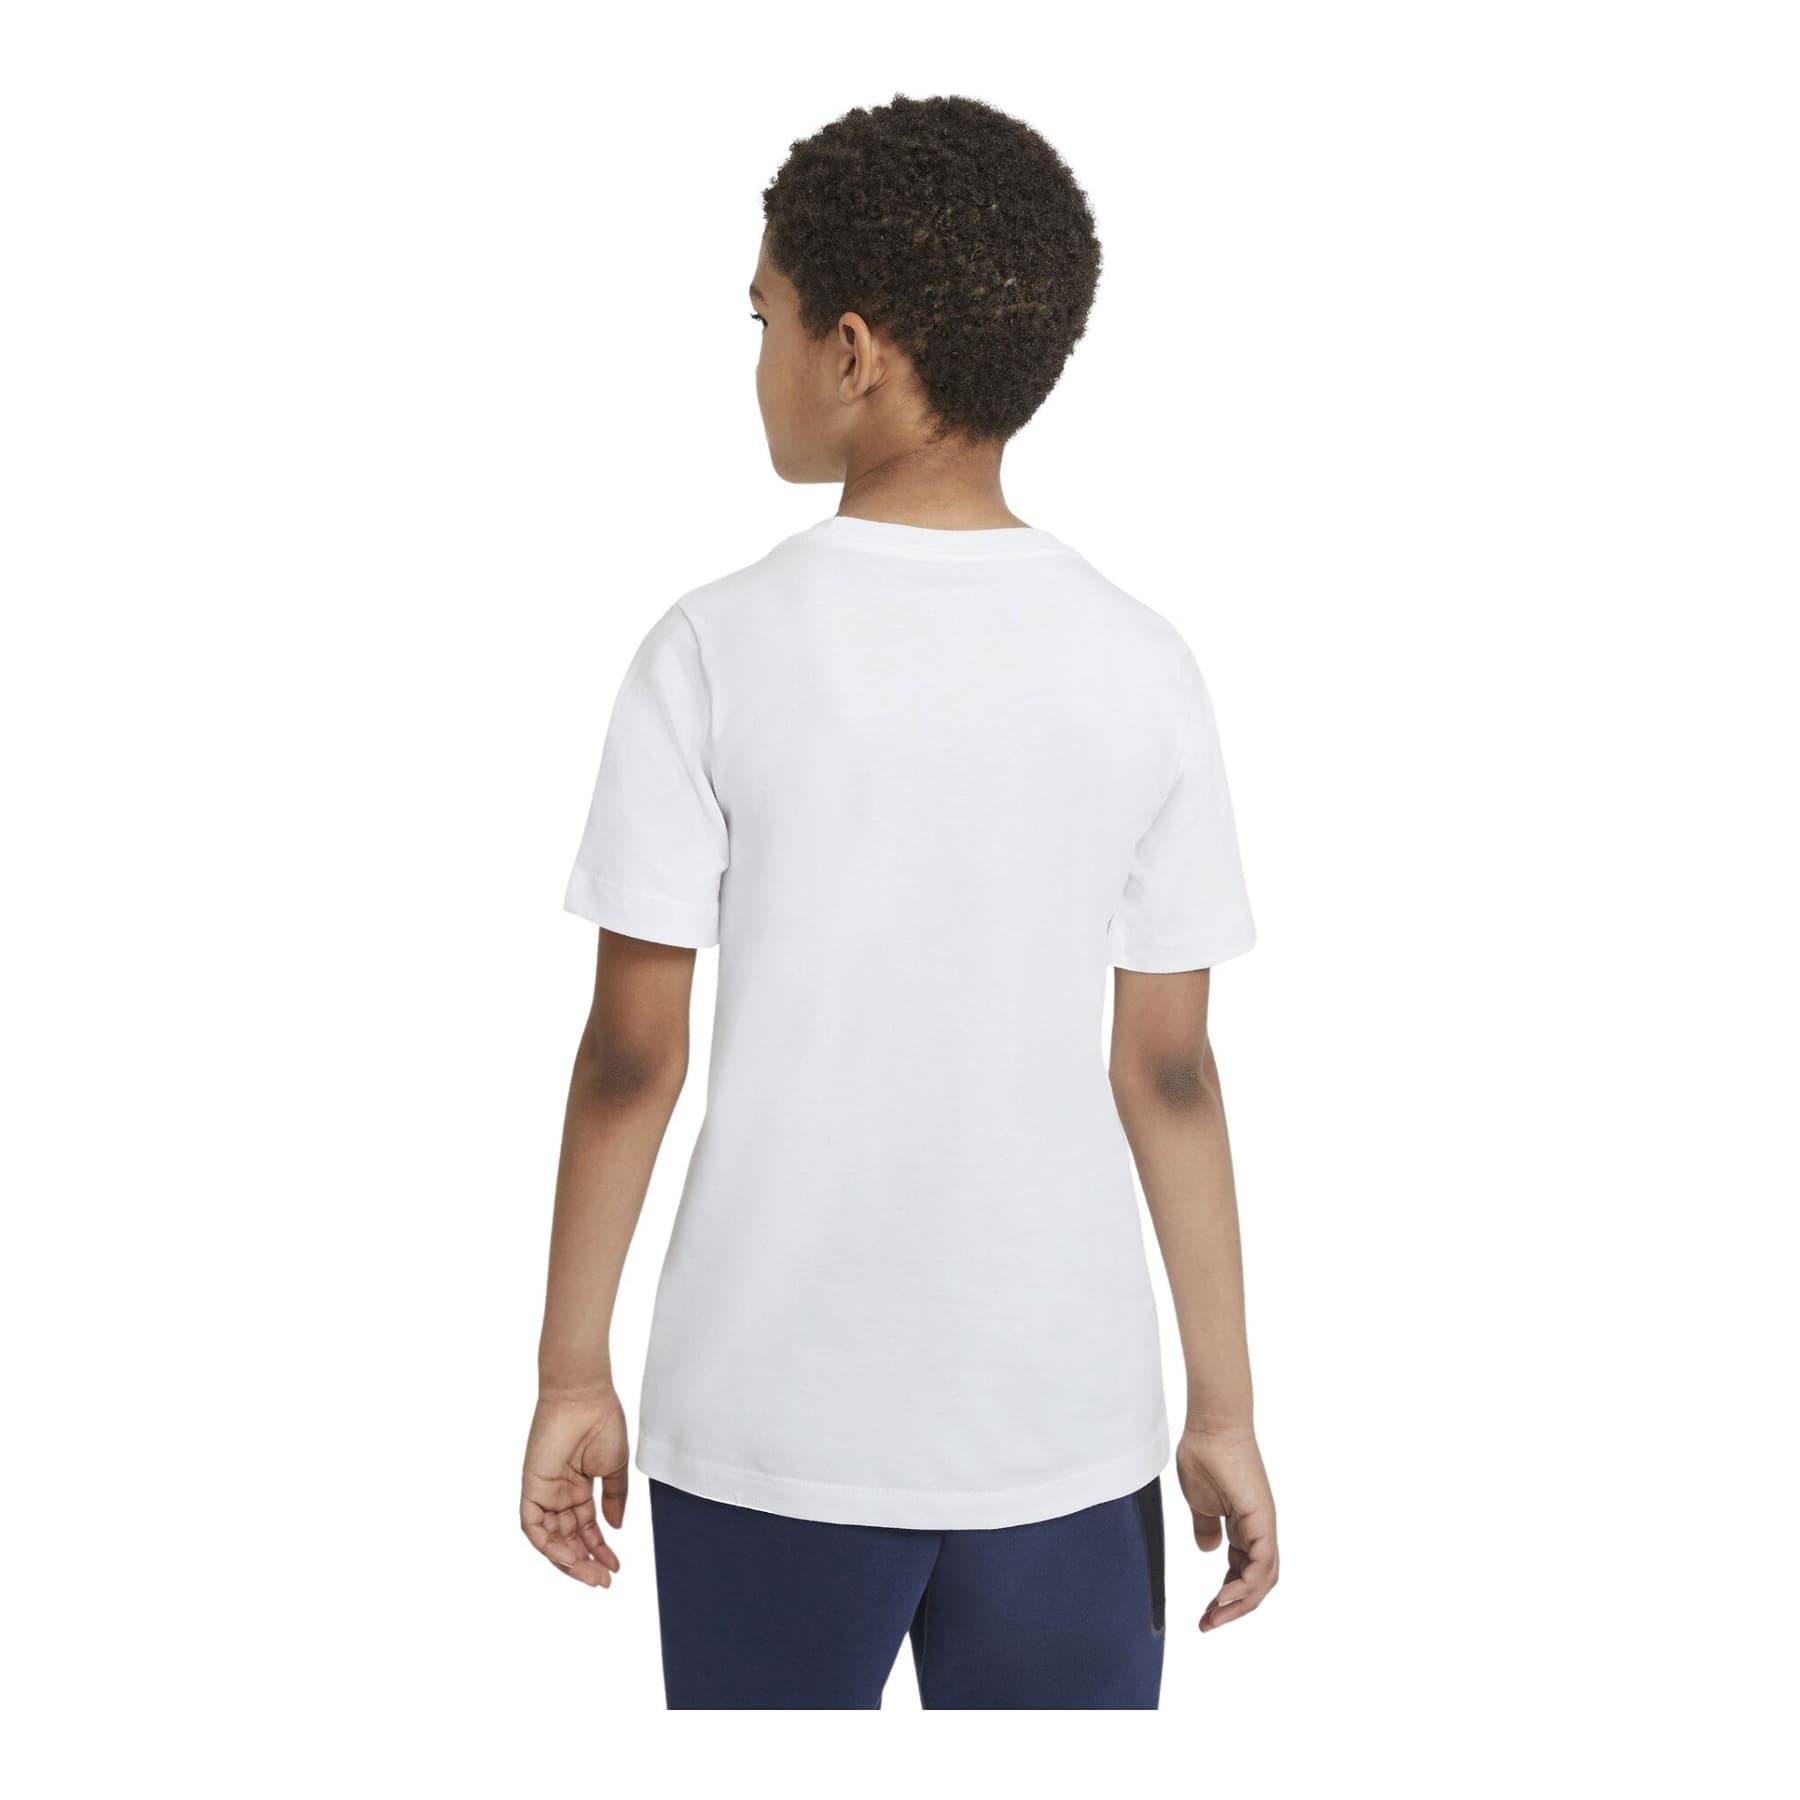 Futura İcon Çocuk Beyaz Spor Tişört (AR5252-107)